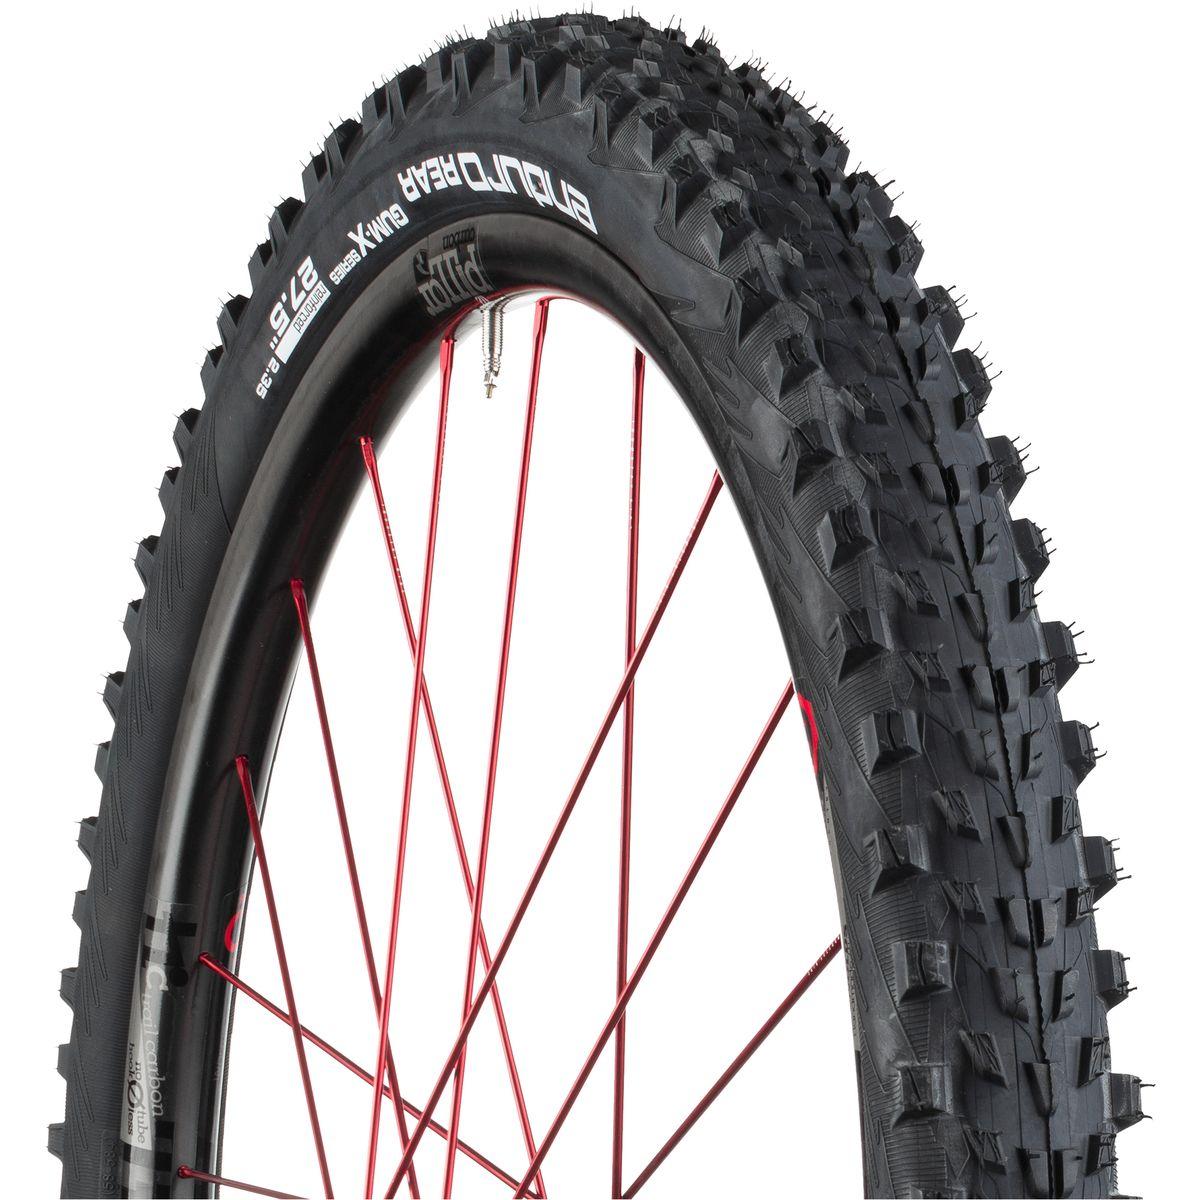 michelin wild race 39 r enduro rear tire competitive cyclist. Black Bedroom Furniture Sets. Home Design Ideas